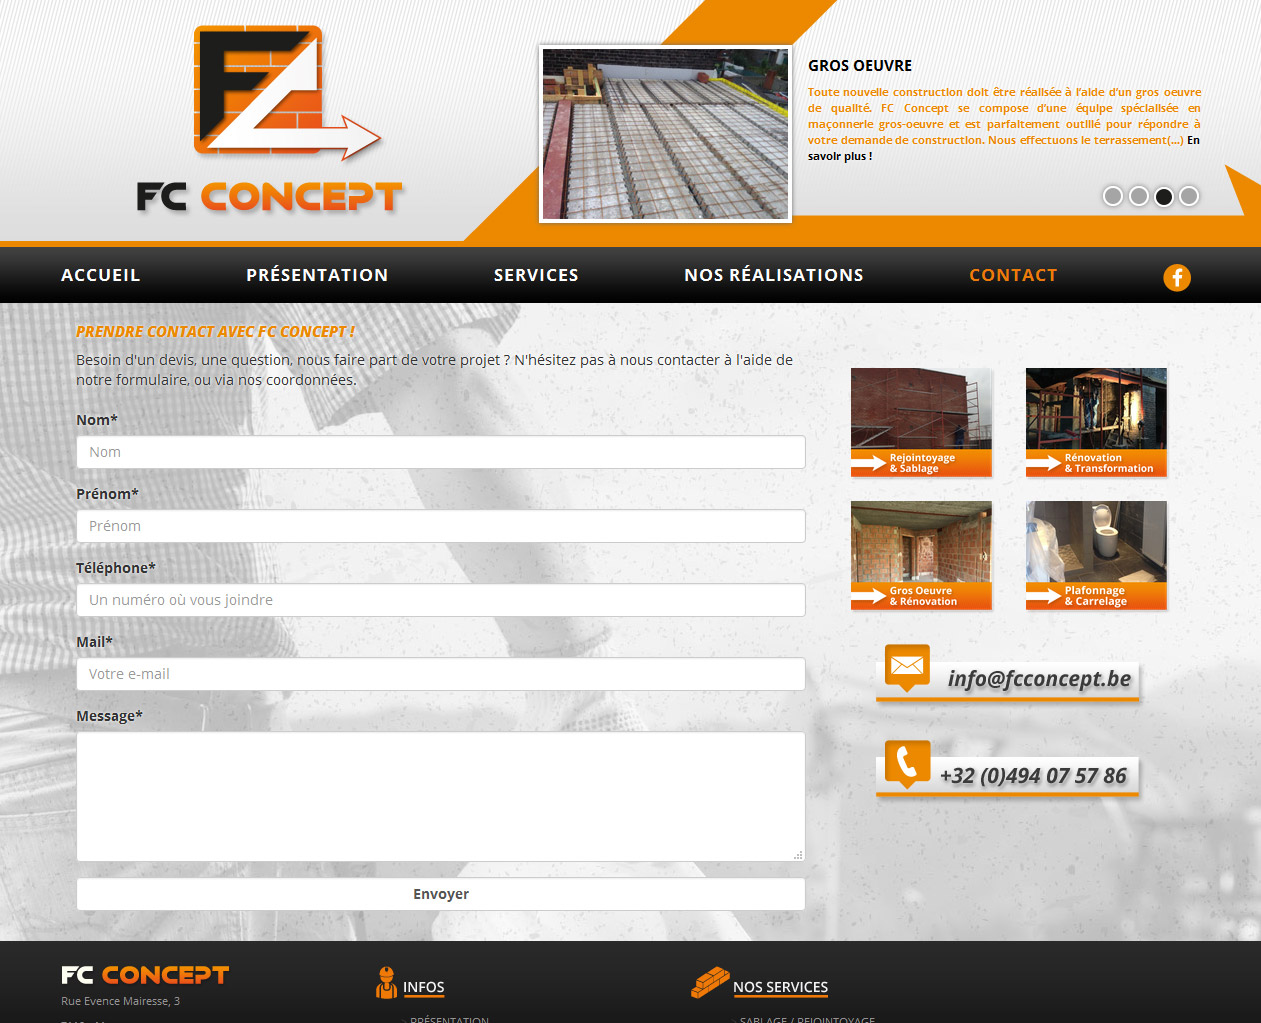 FC Concept